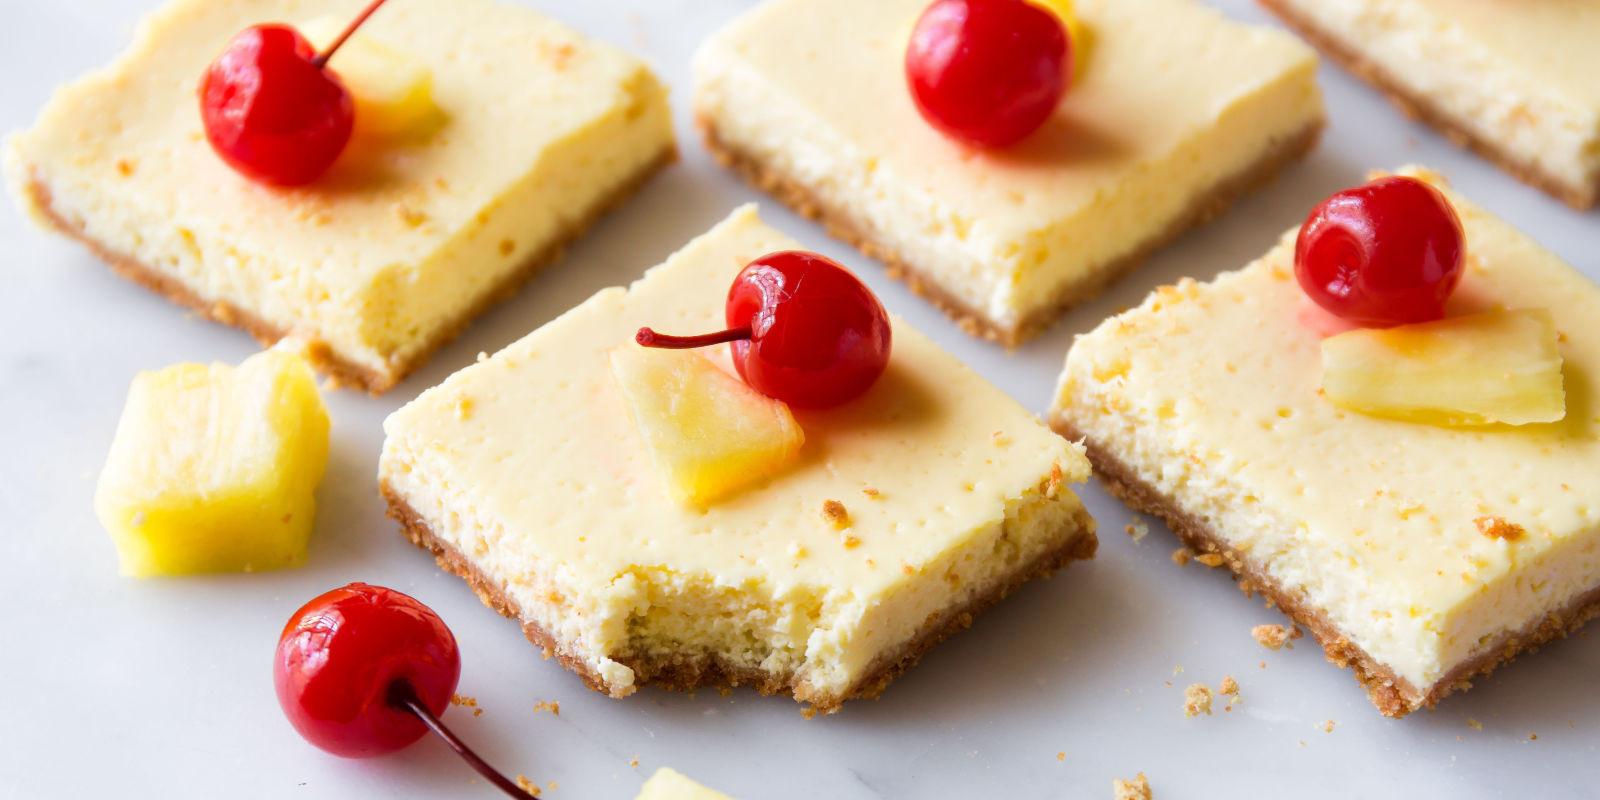 Healthy Dessert Restaurants  30 Healthy Low Calorie Desserts Recipes for Diet